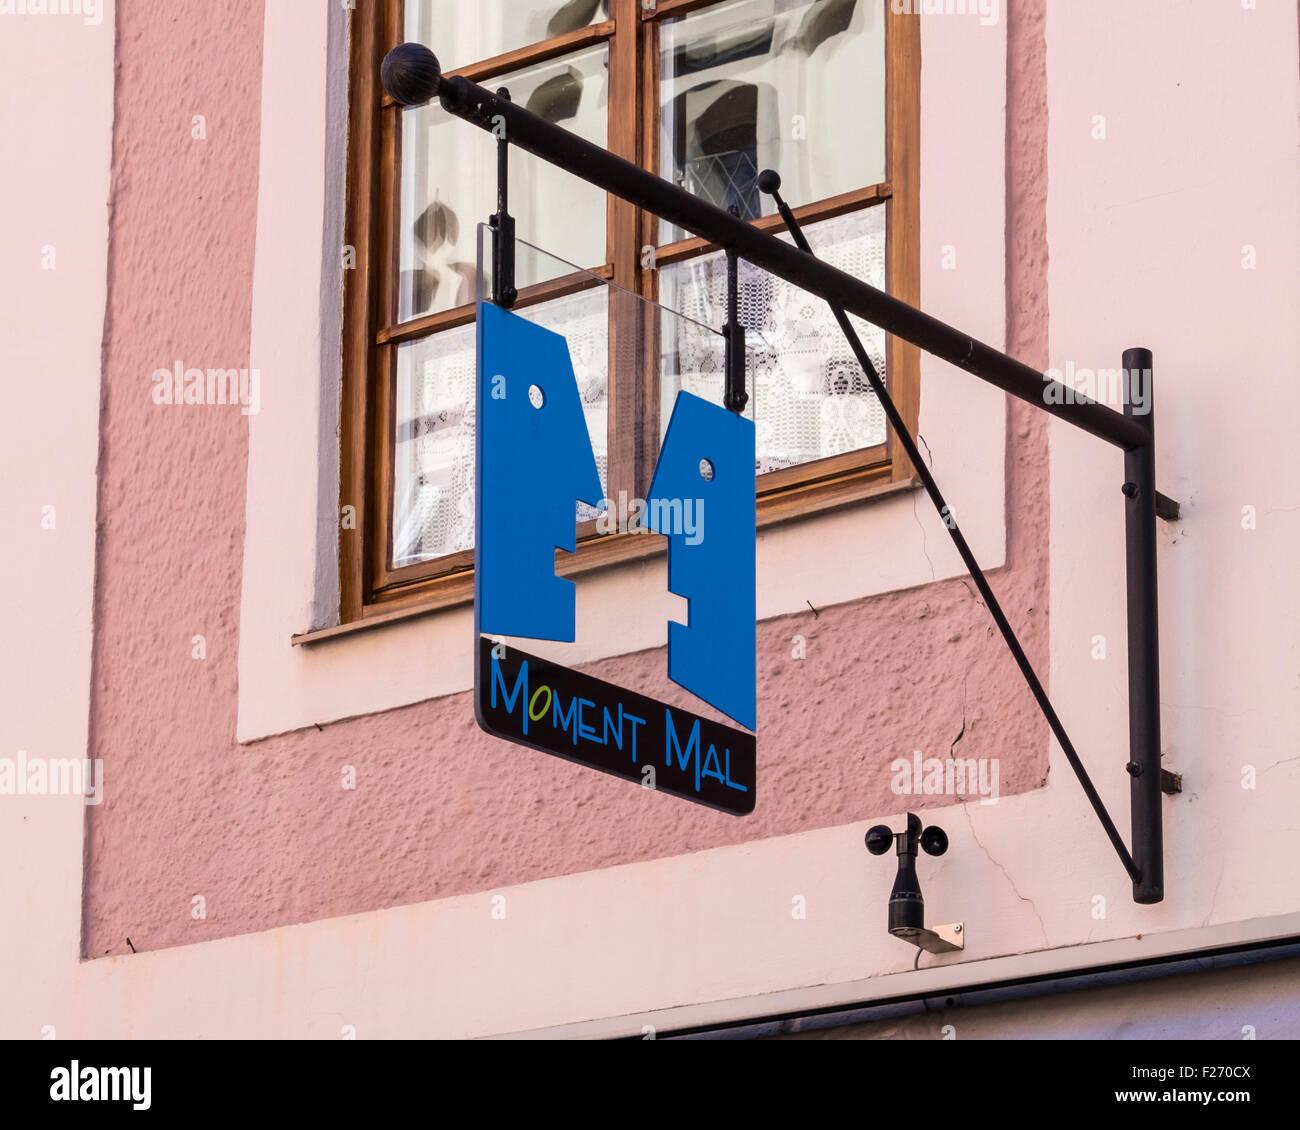 Moment Mal shop sign on pink building in Füssen Town, Ostallgaü, Bavaria, Germany - Stock Image